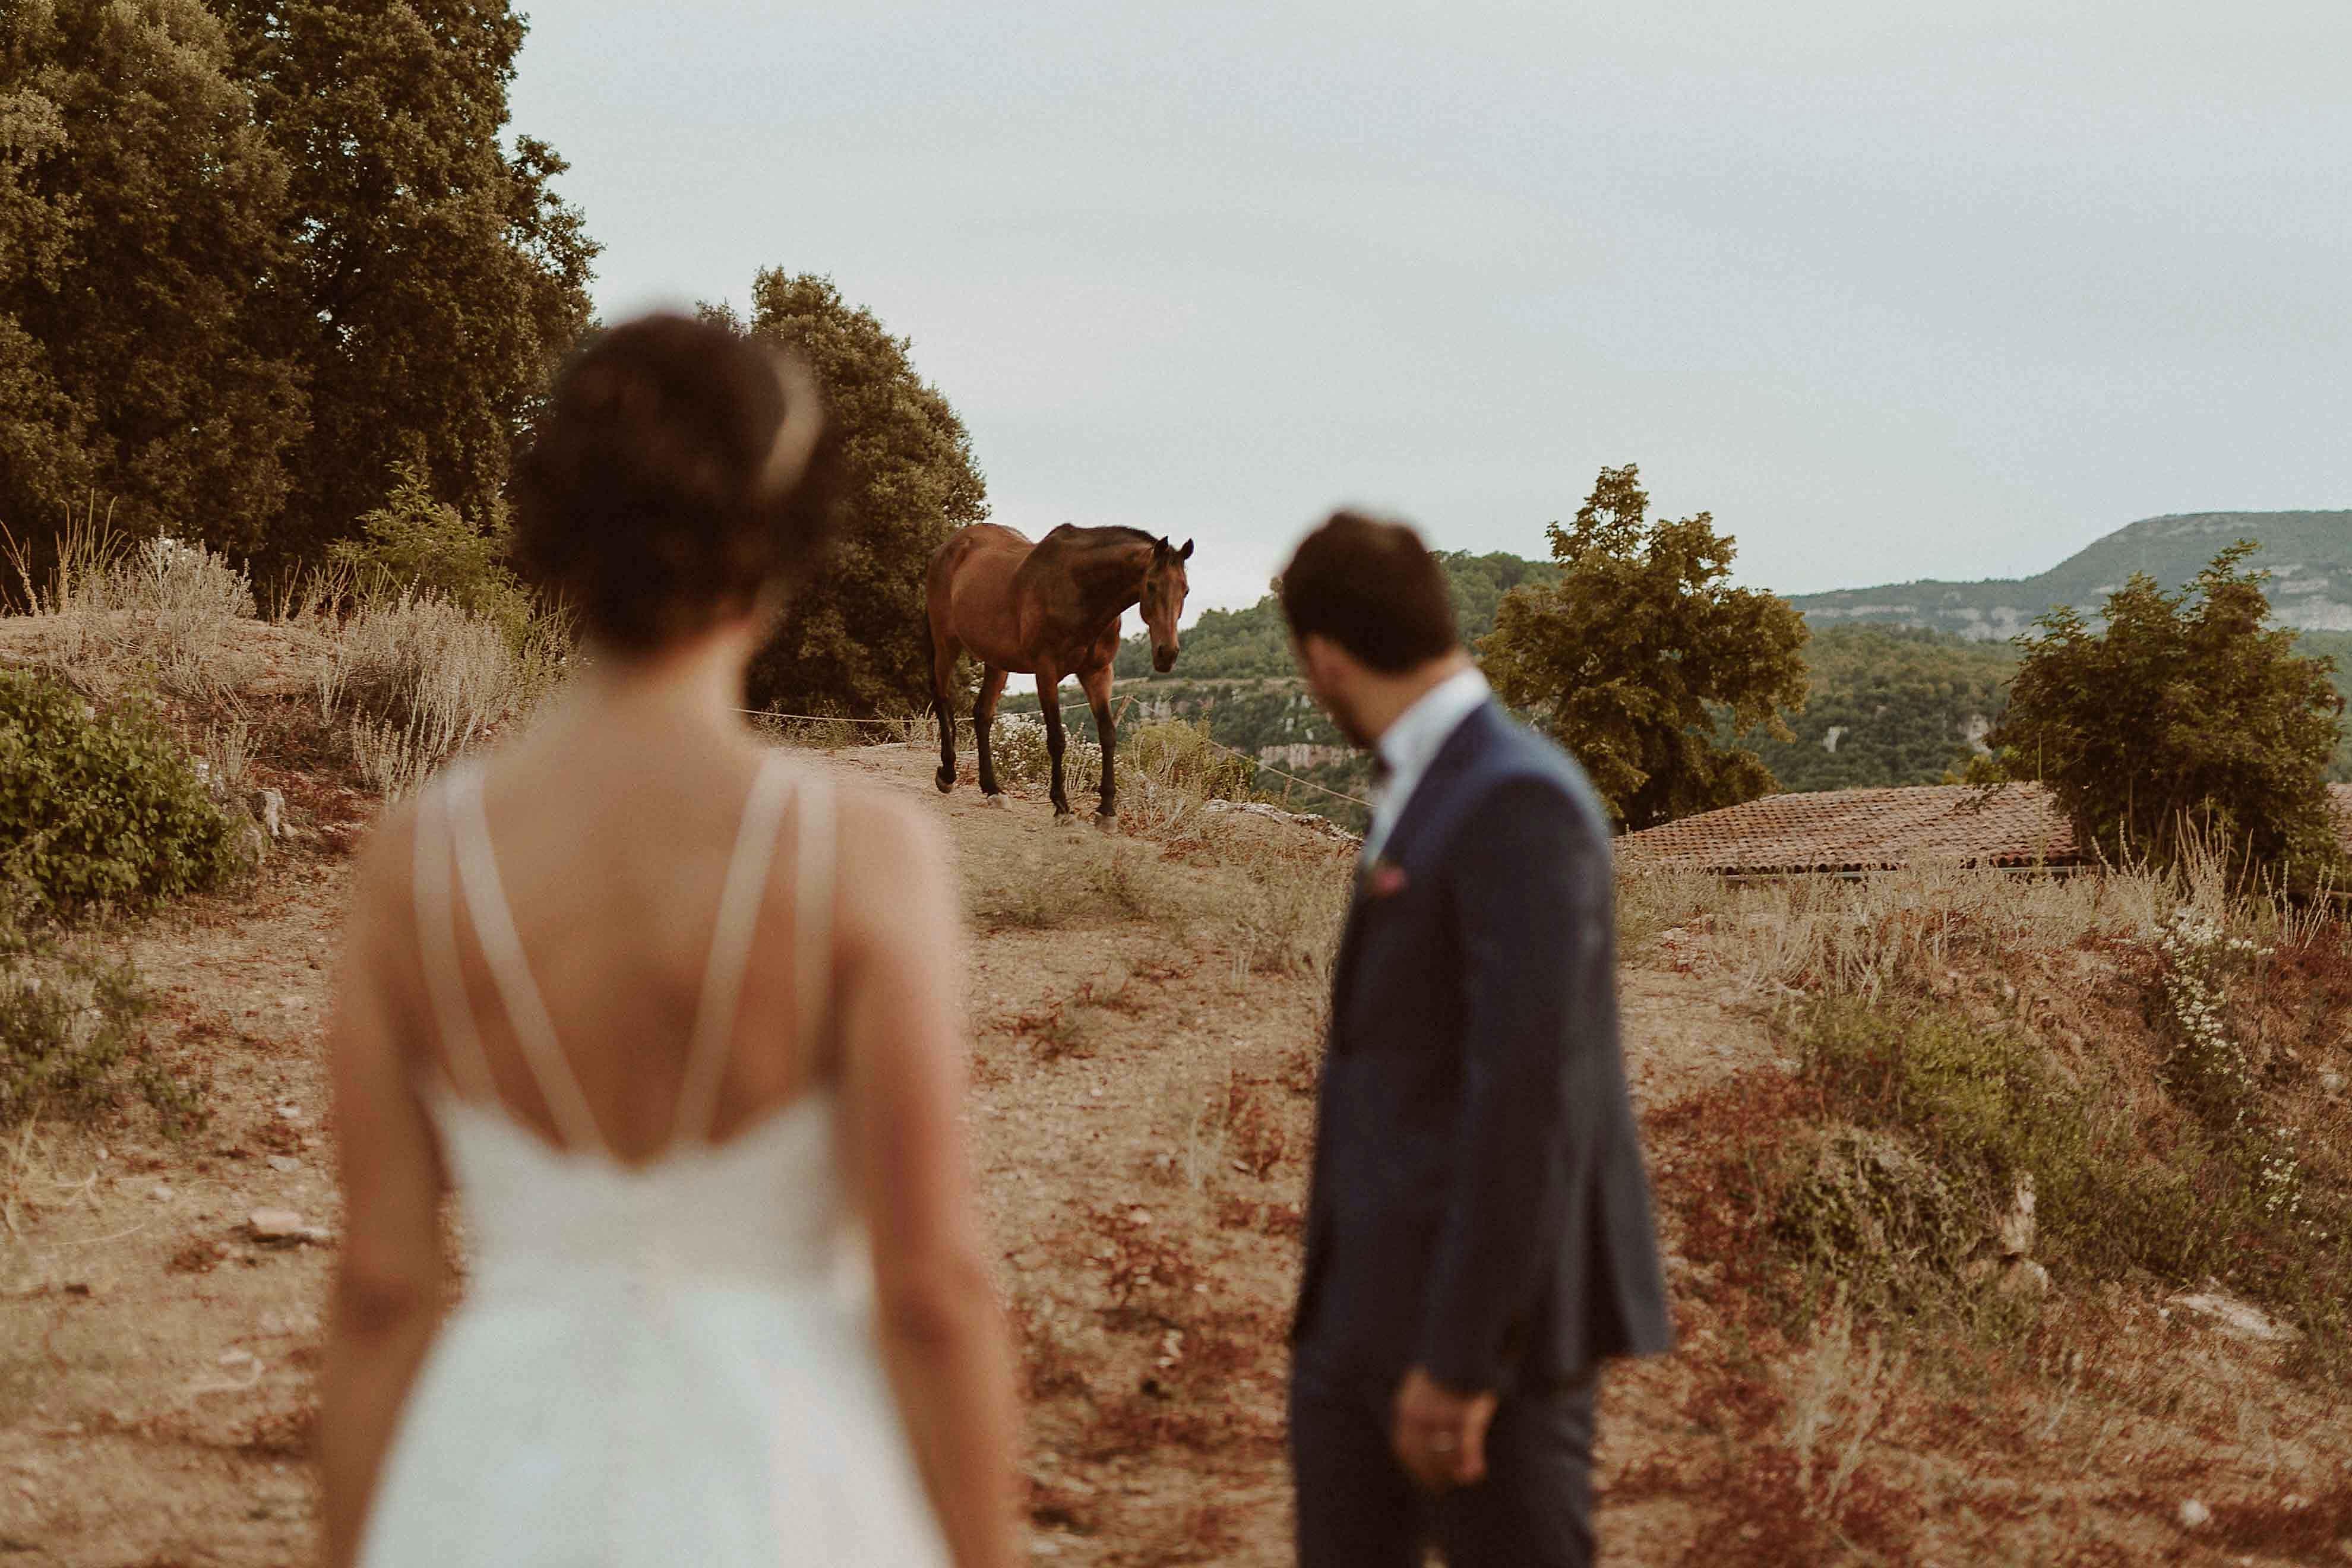 Boda rústica en la montaña. fotgrafo de bodas barcelona_090